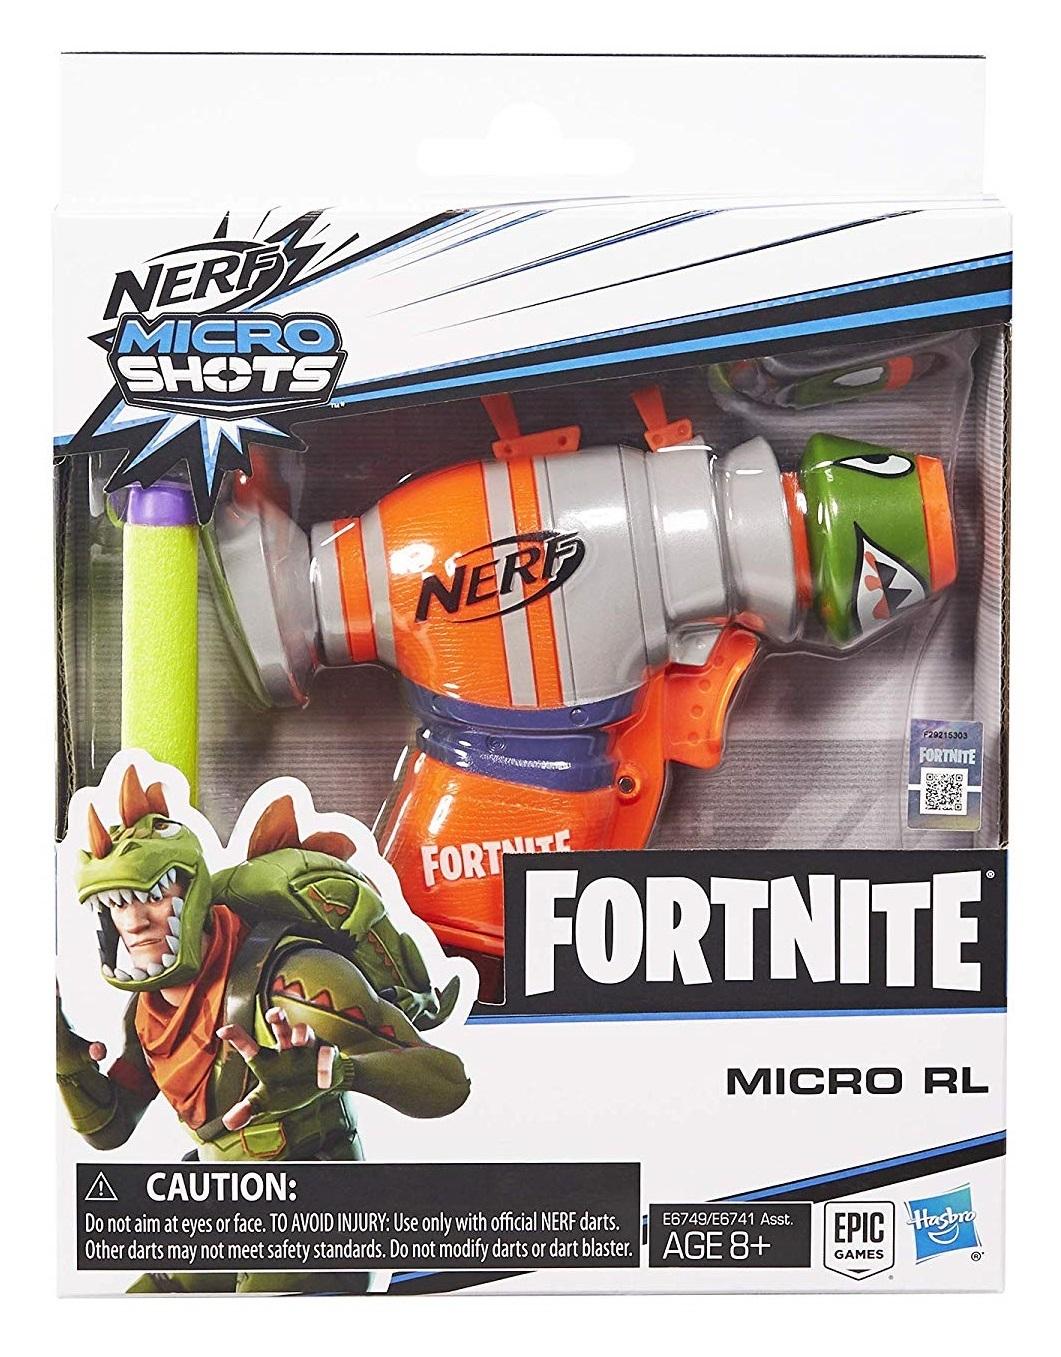 Nerf Fortnite: MicroShots Blaster - Micro RL image